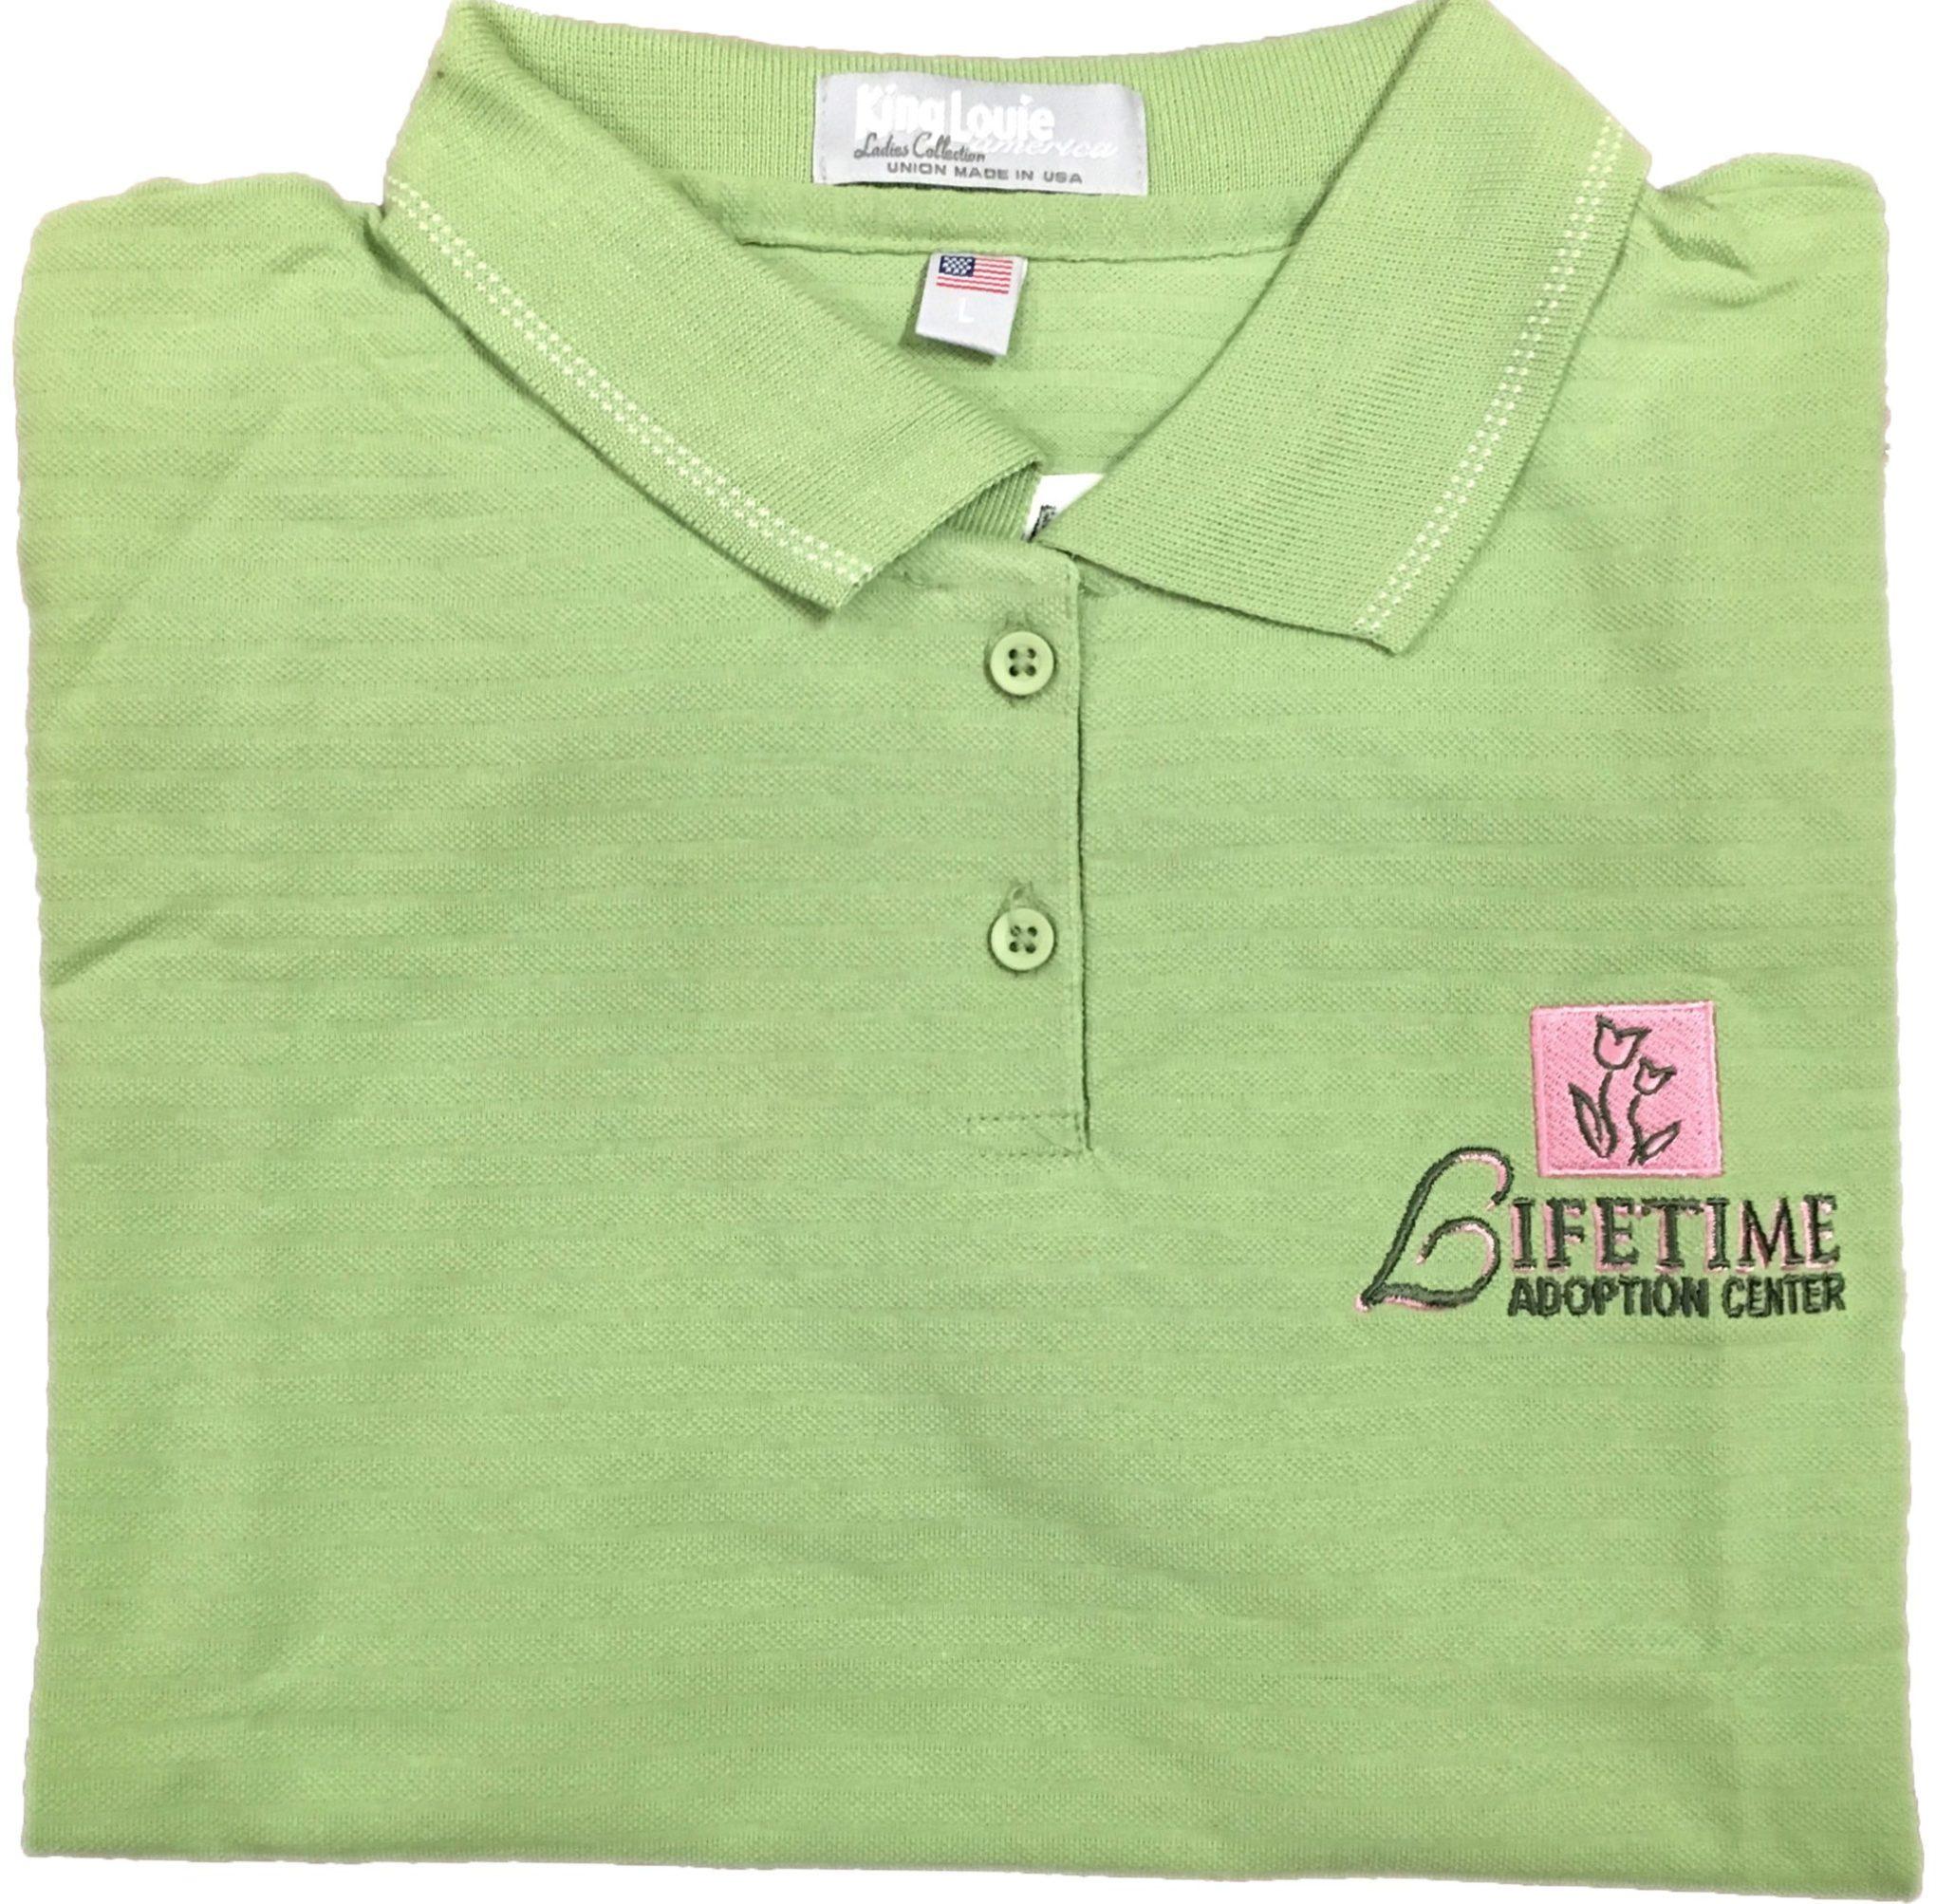 Green Lifetime Adoption Shirt